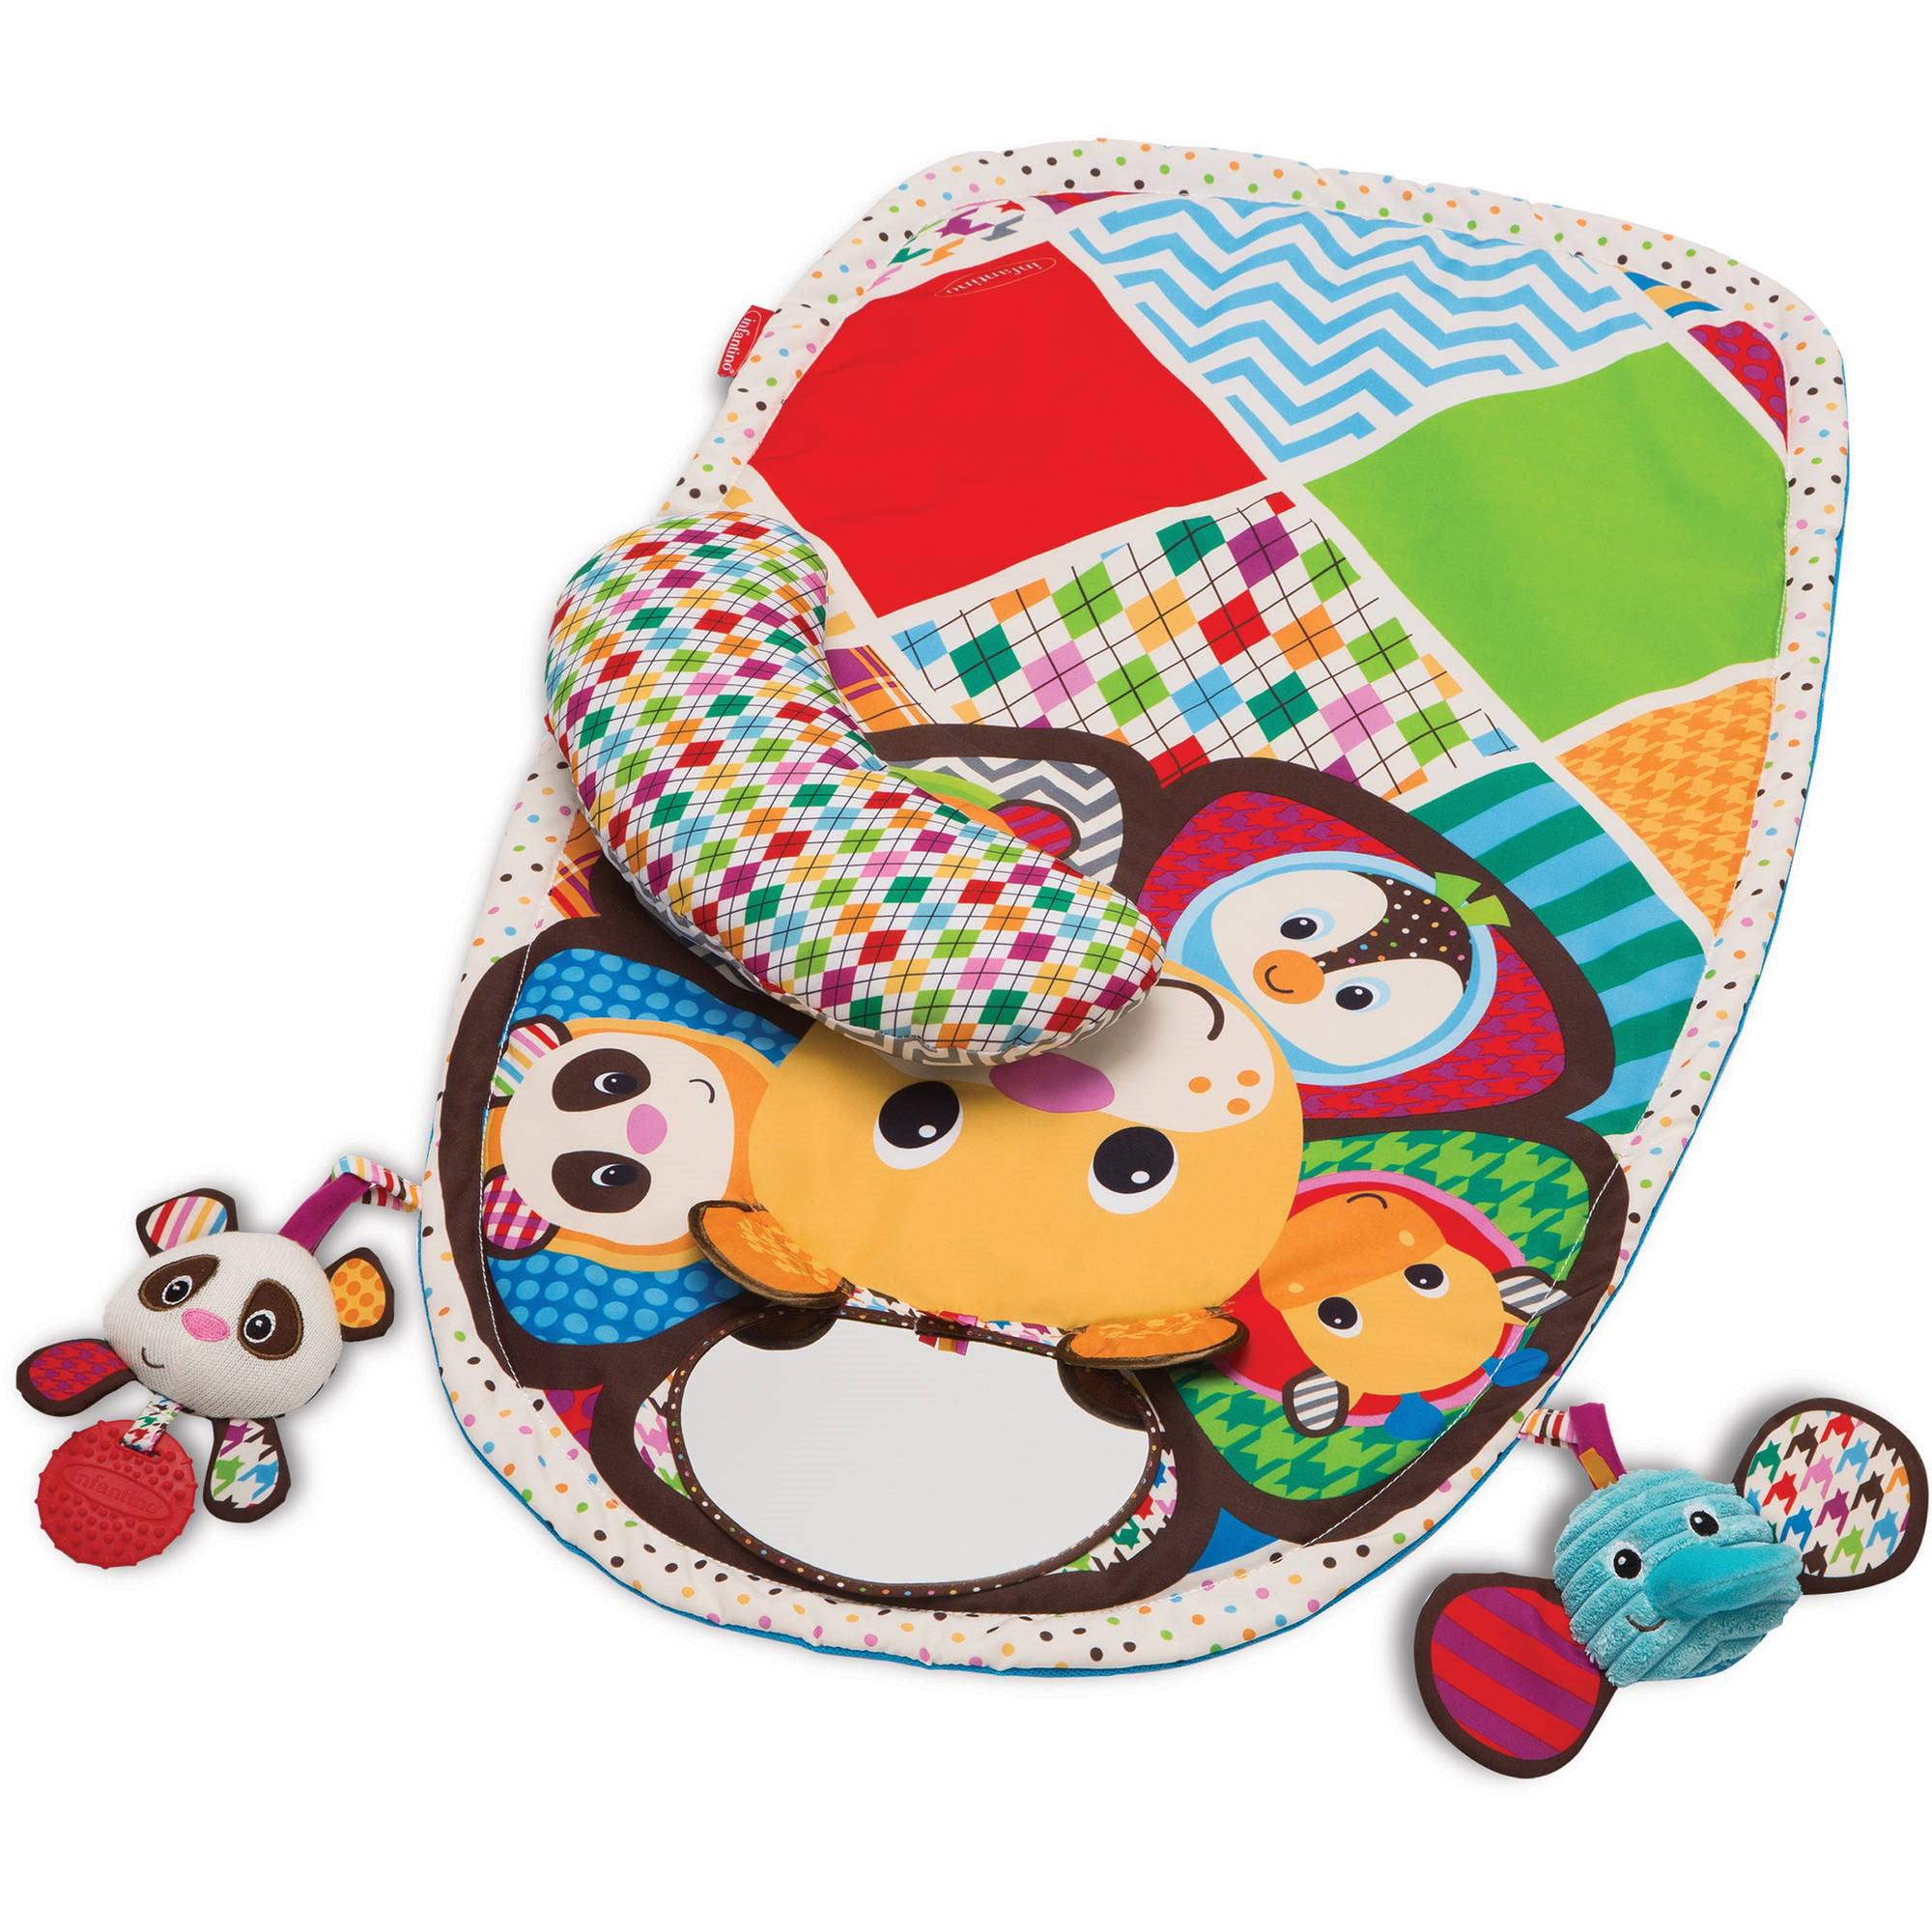 Infantino See Play Go Peek & Play Tummy Time Activity Mat